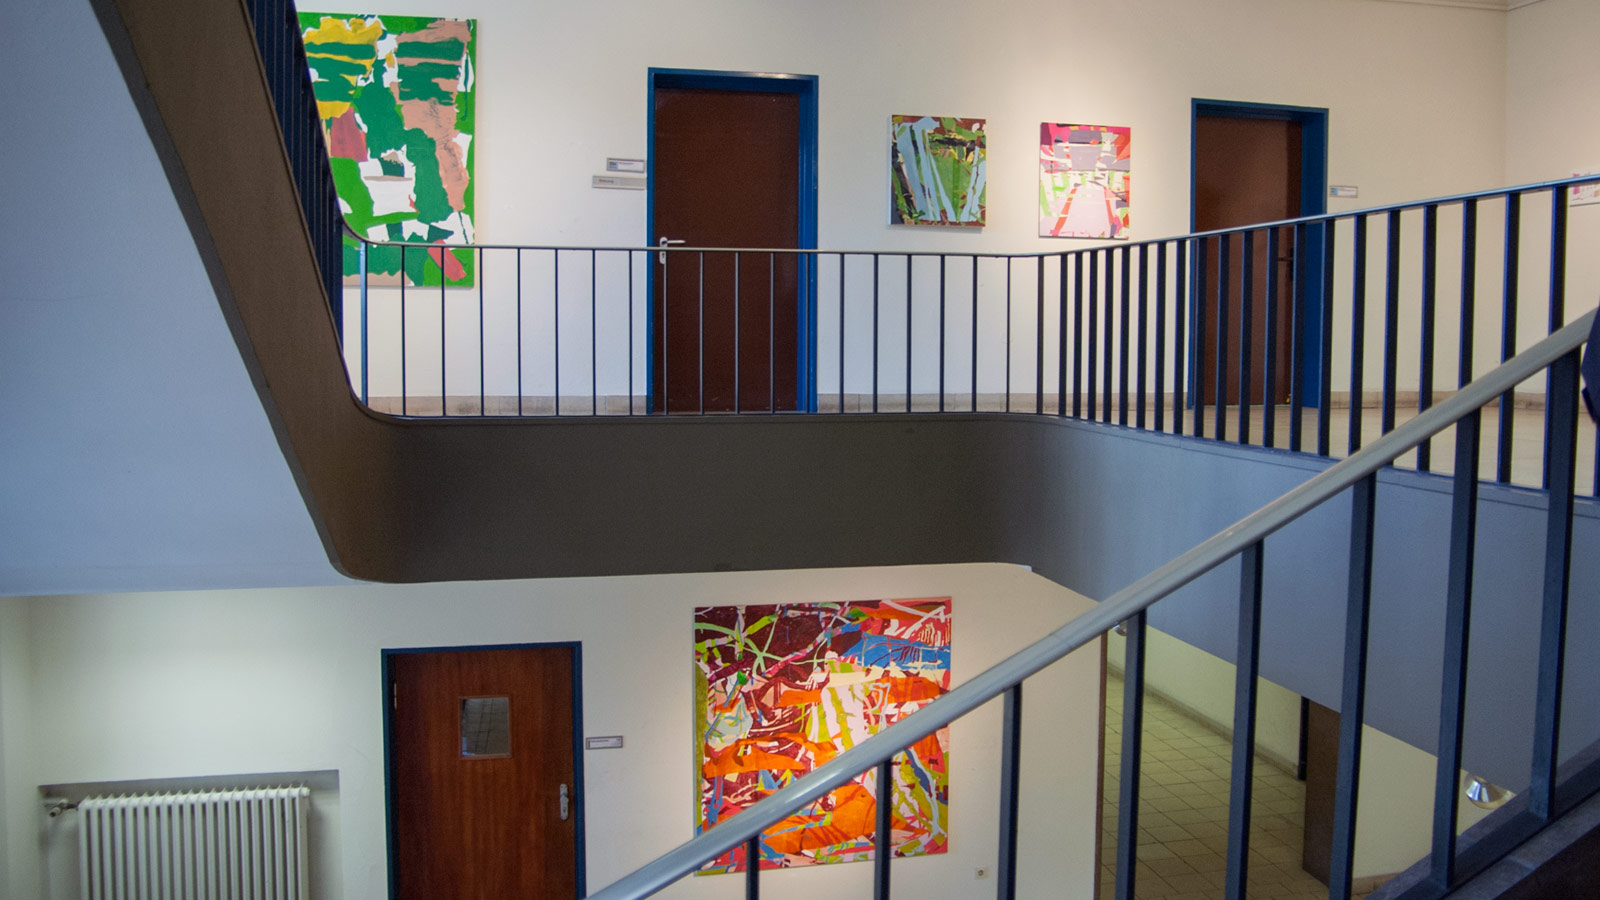 Andreas Wolf Stadtgalerie Mannheim Ausstellungsansicht